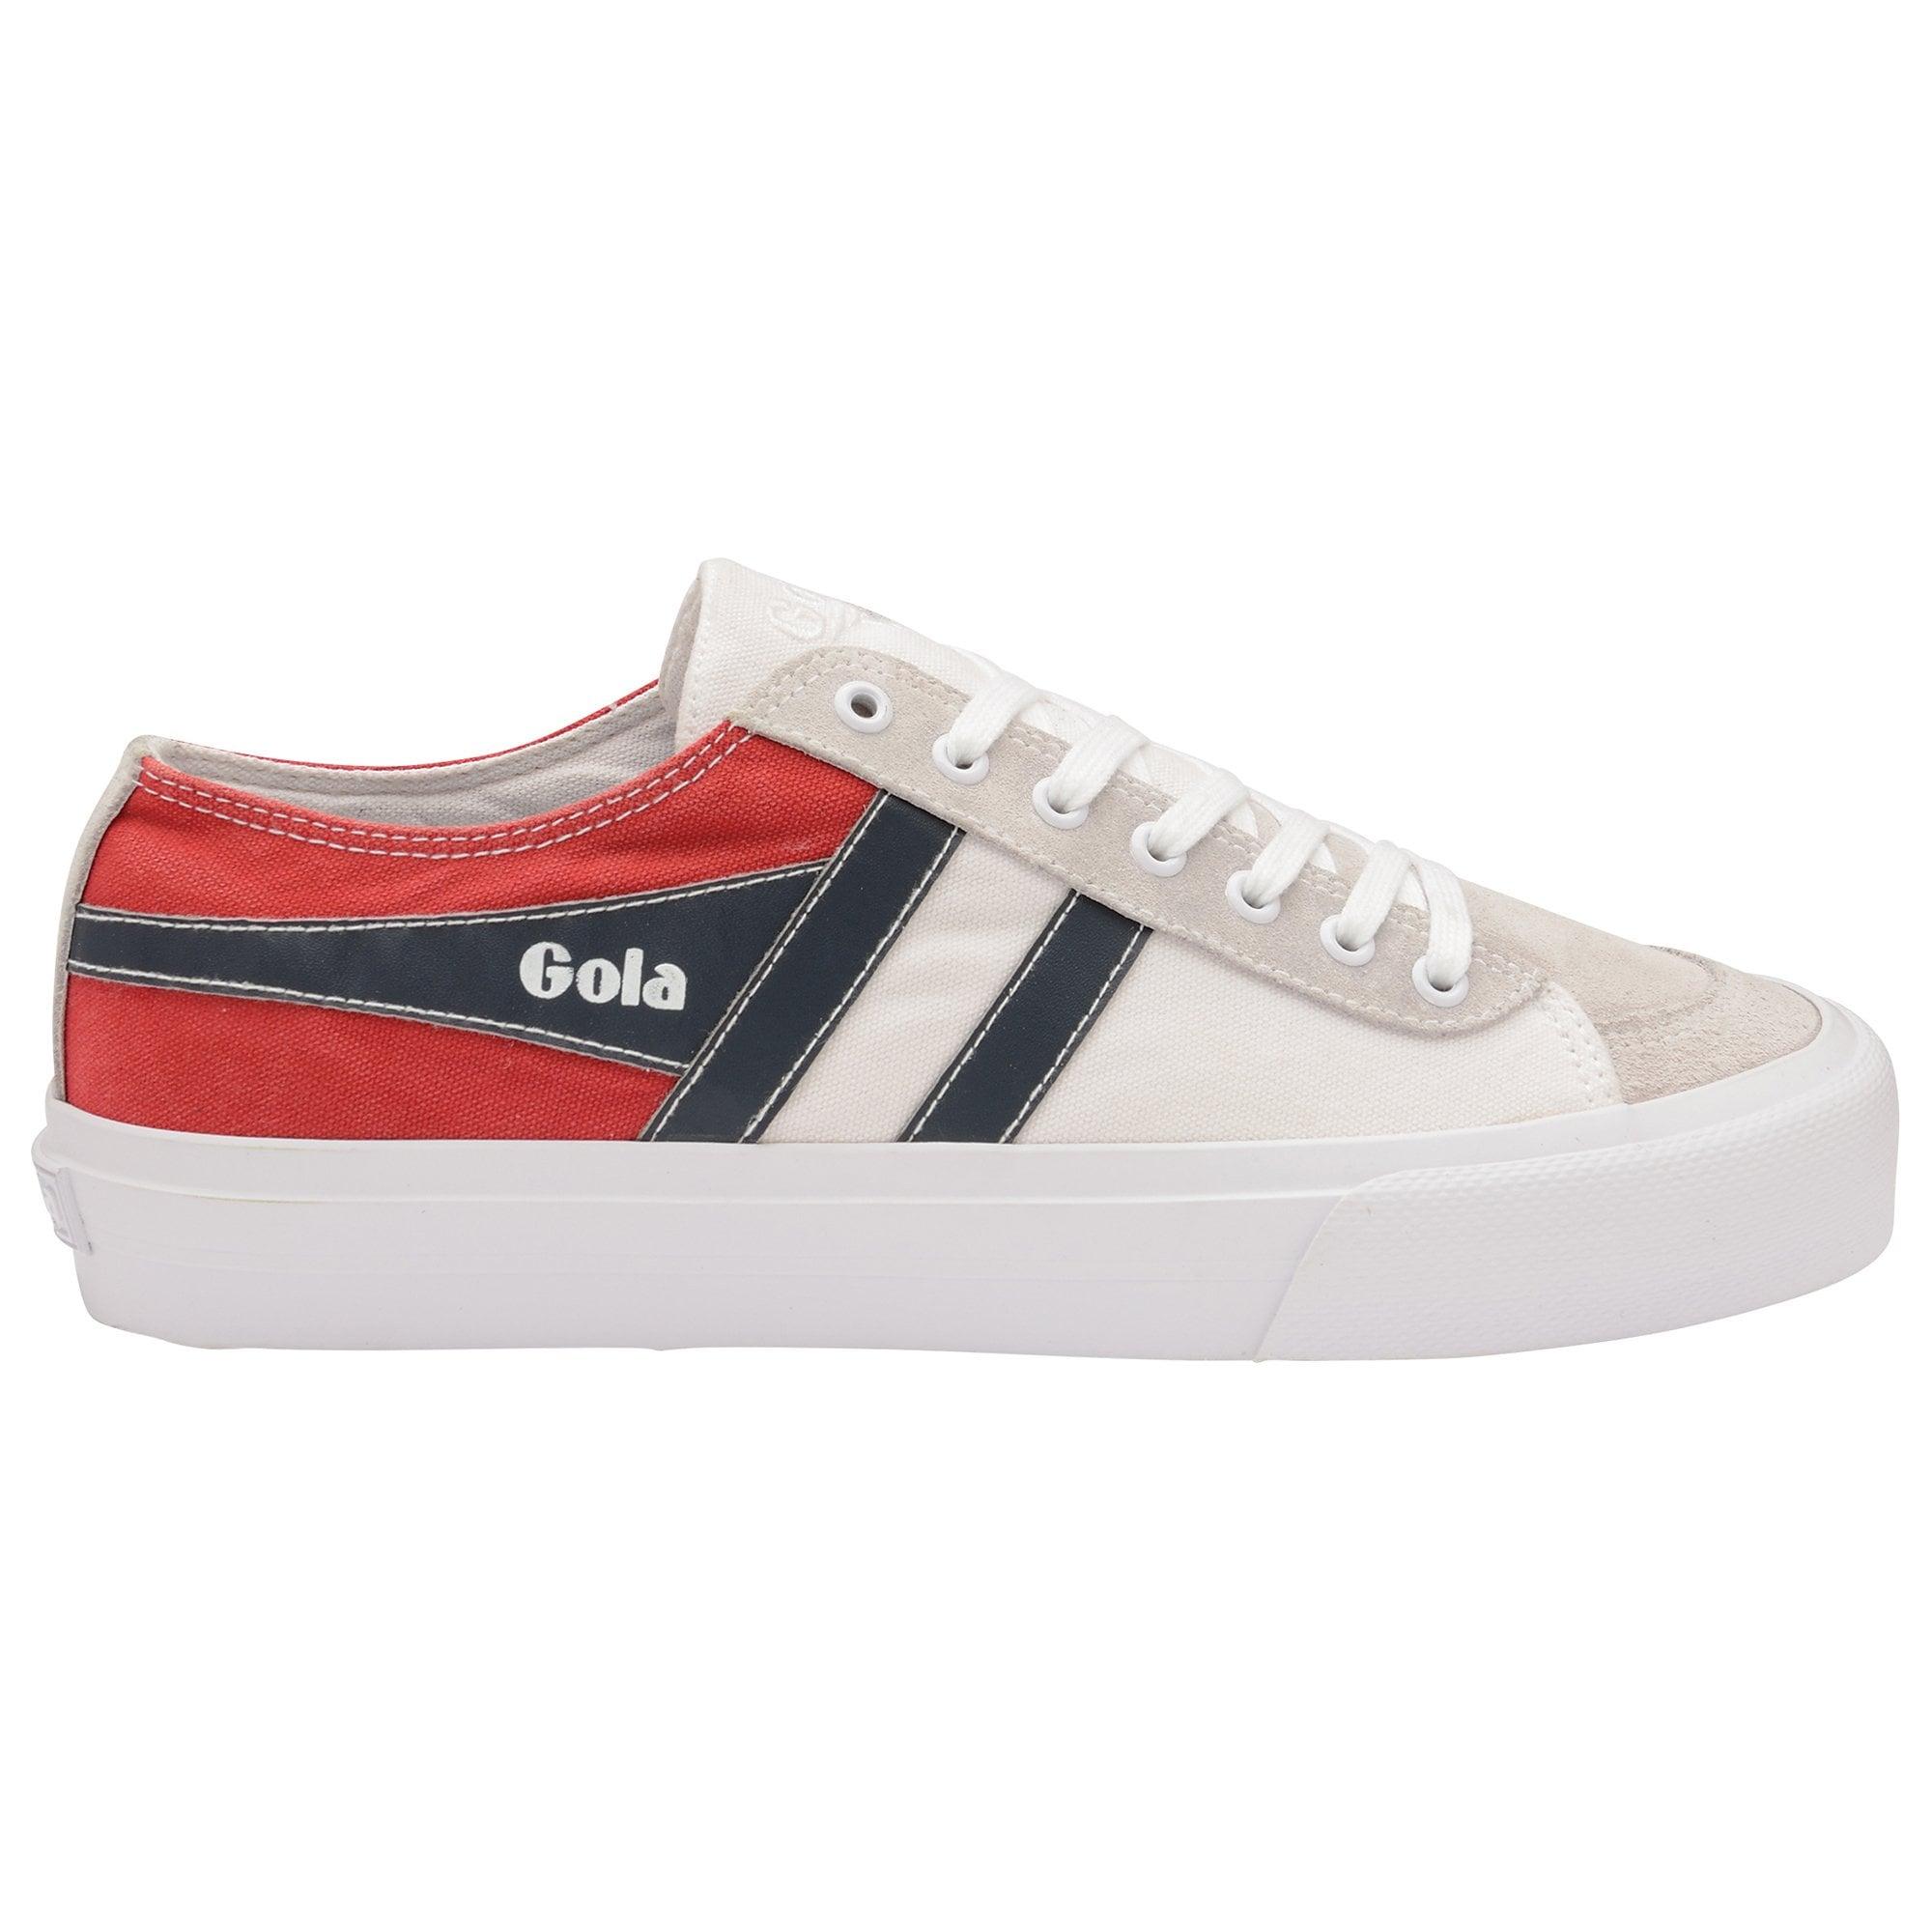 Buy Gola mens Quota II RWB White/Red